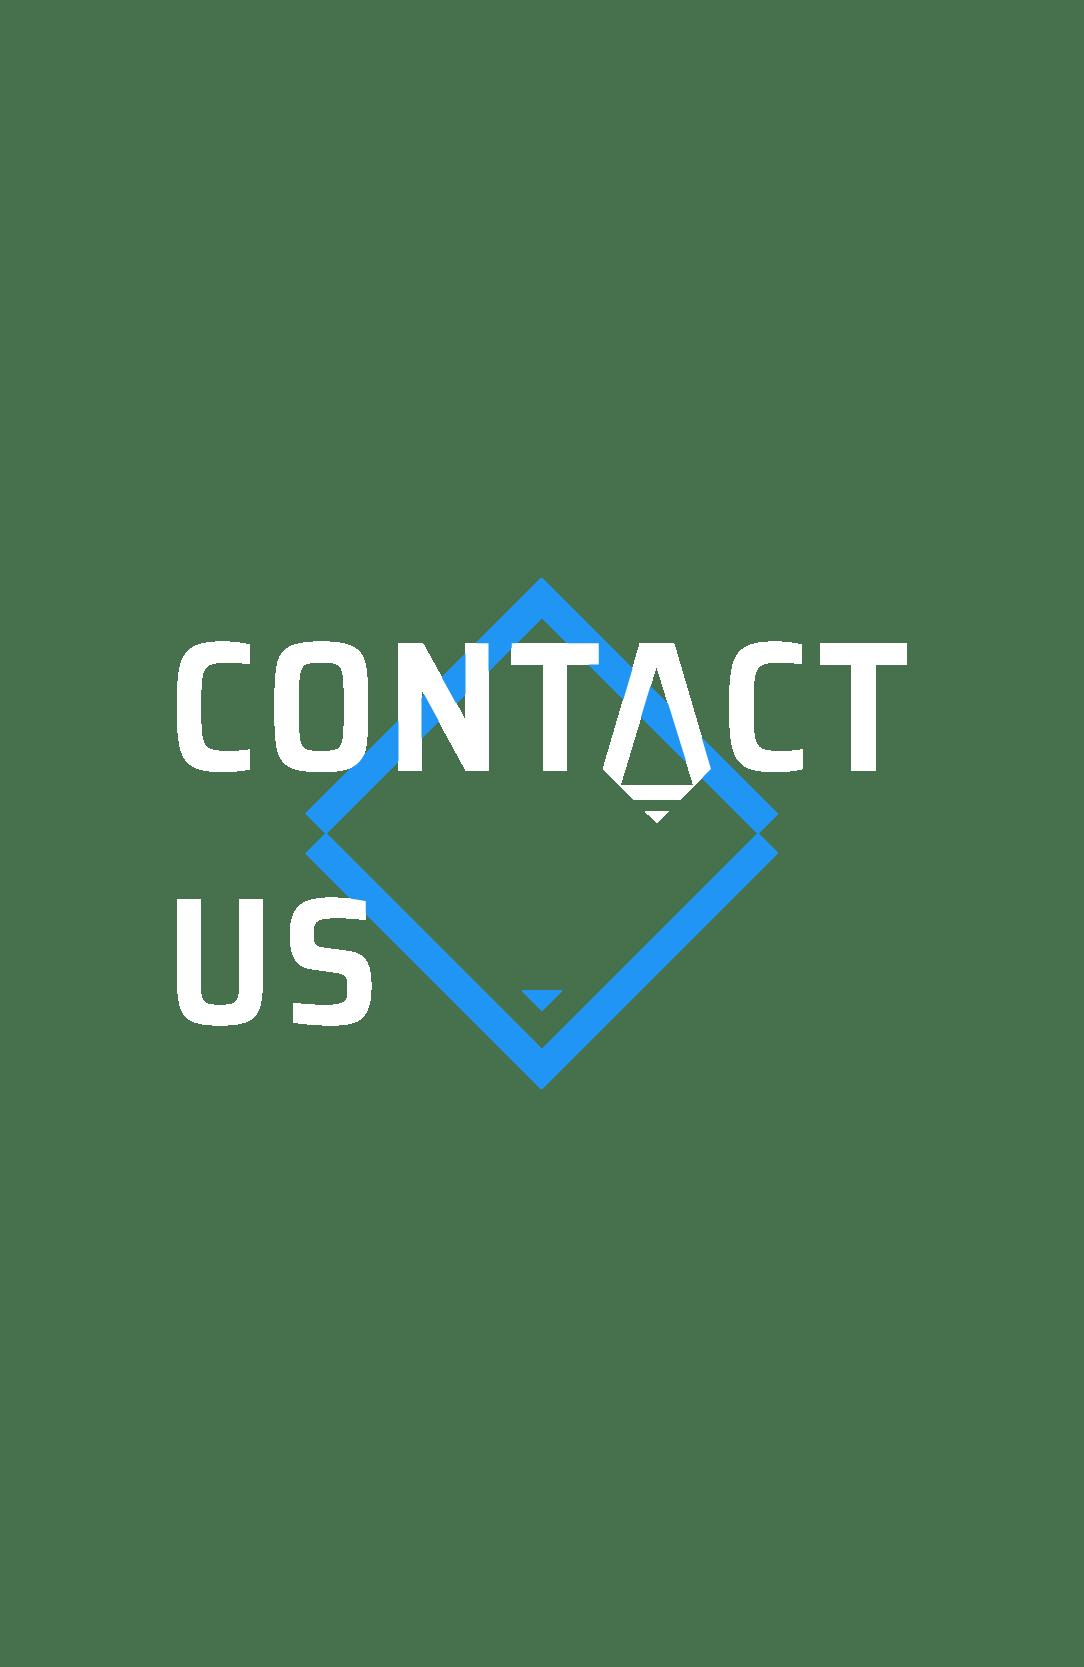 XAXs heading Contact Us